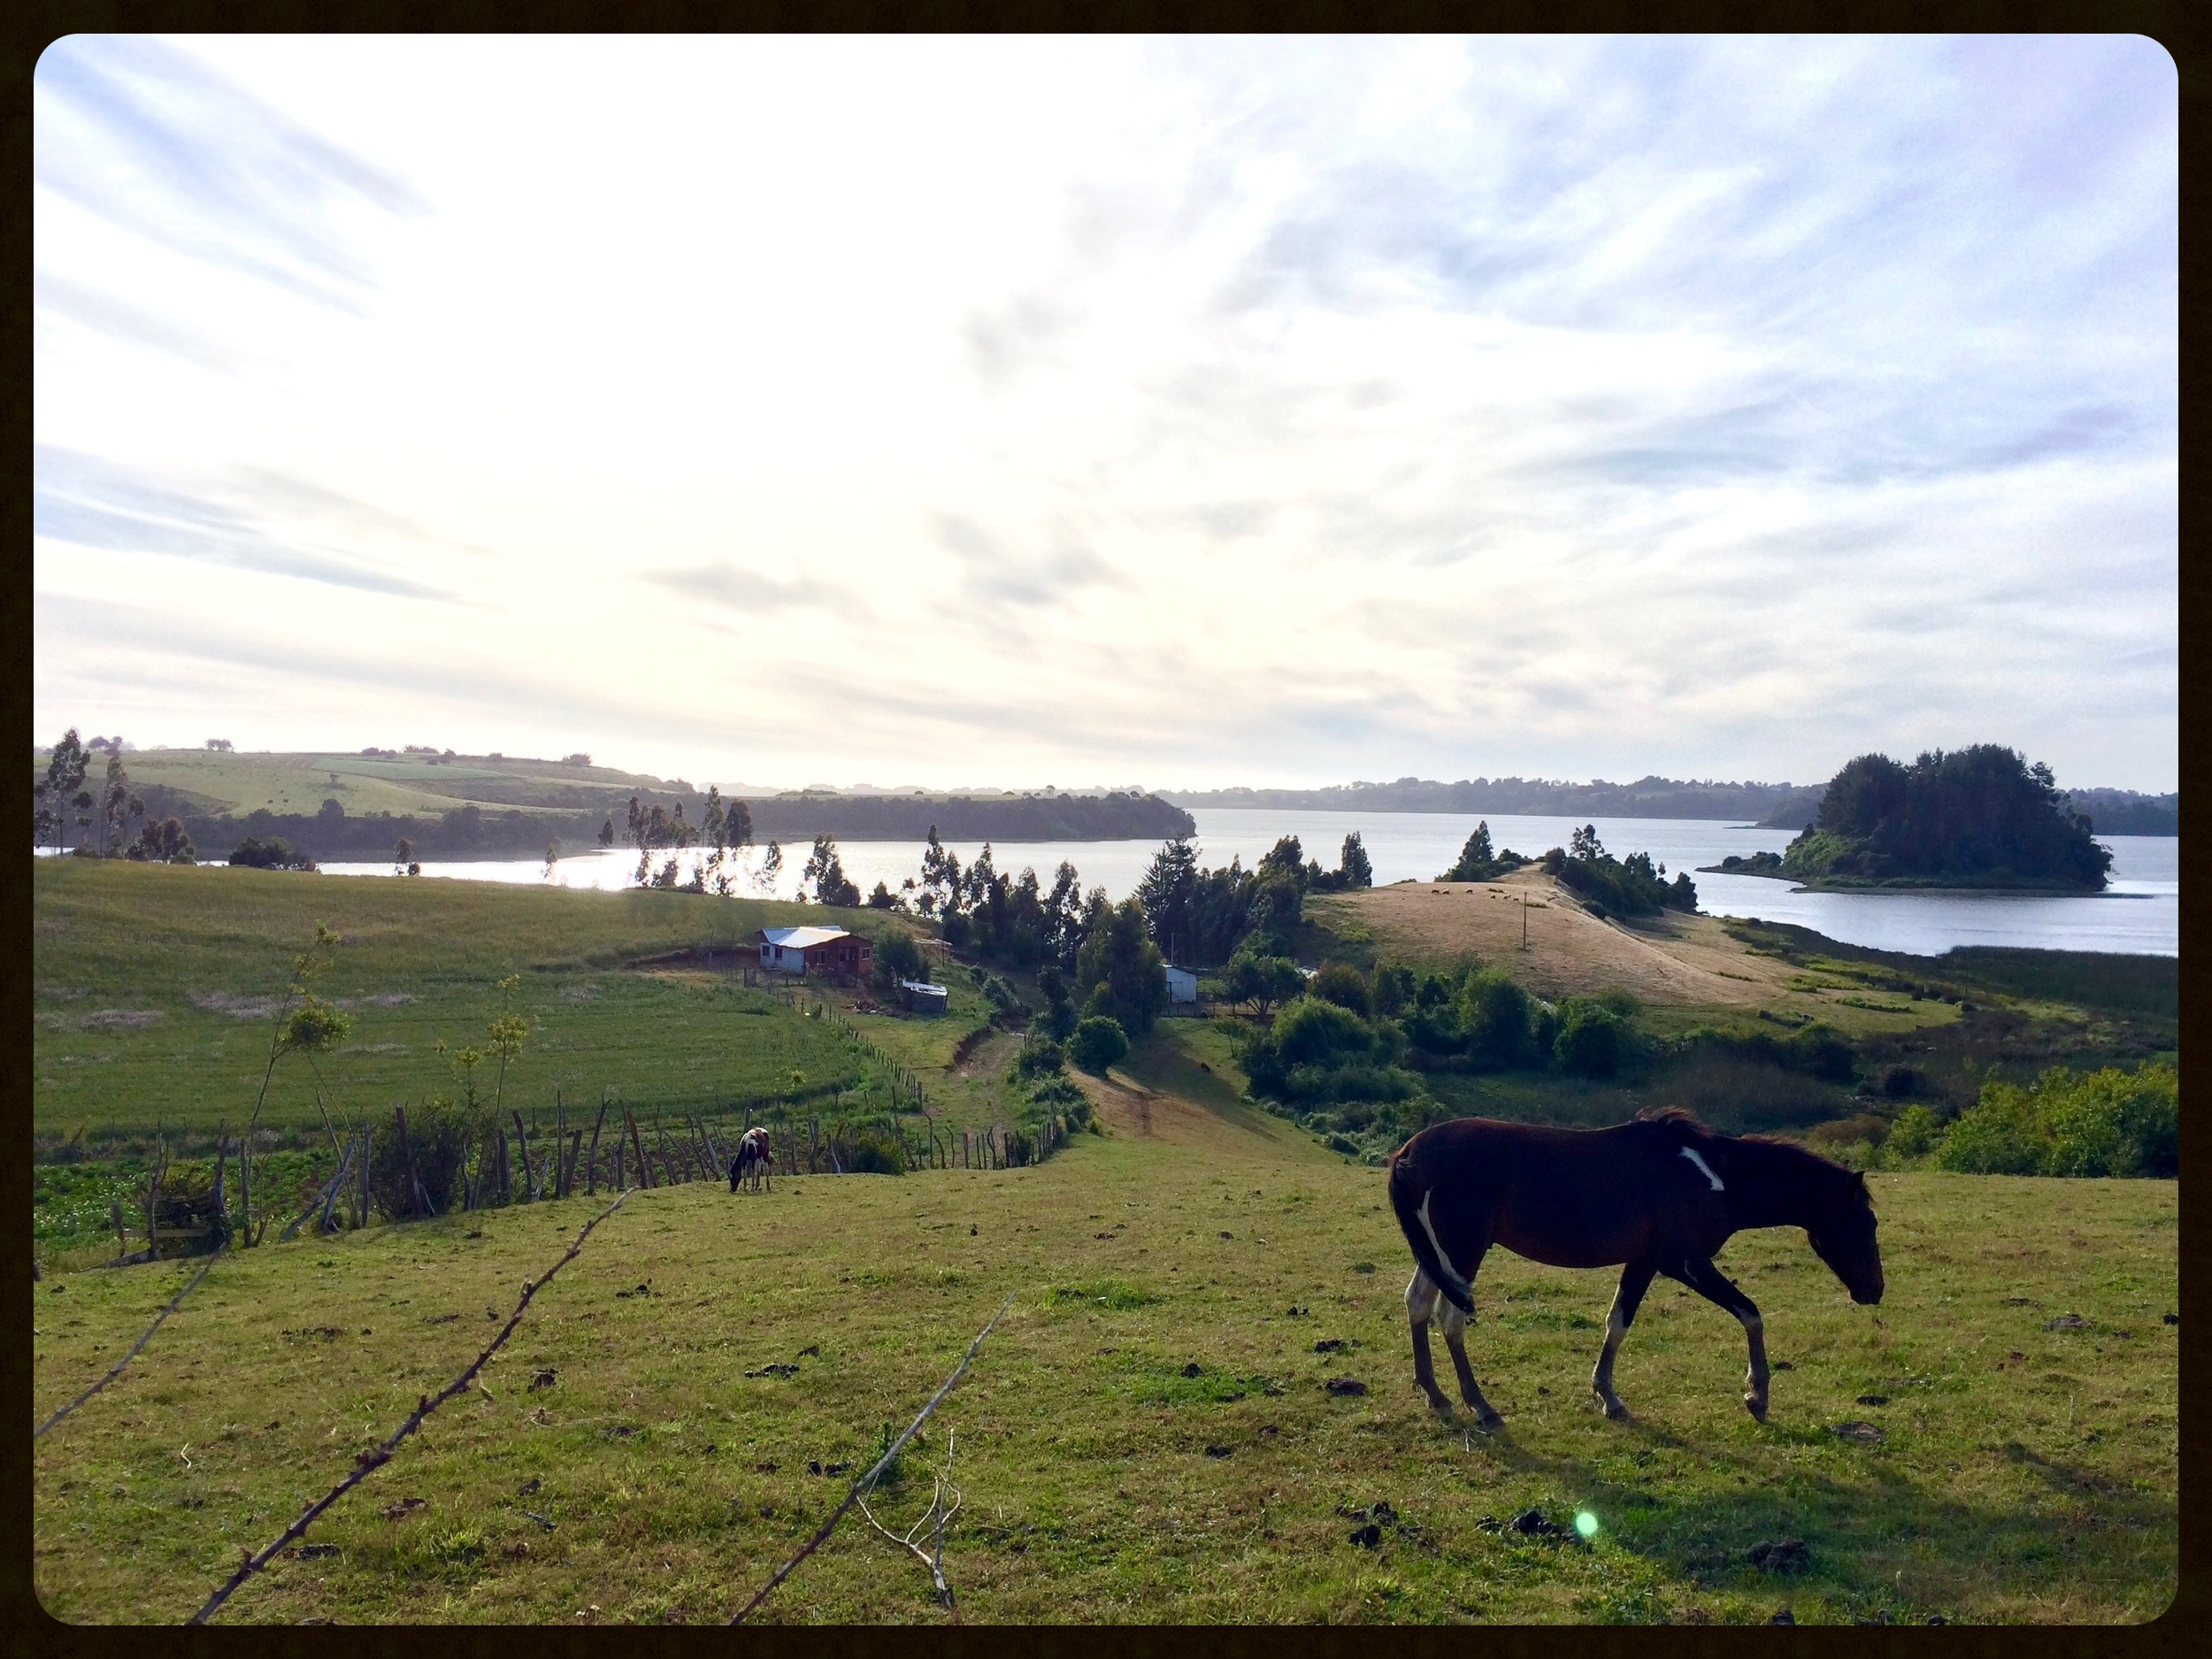 Horses grazing near Lake Budi